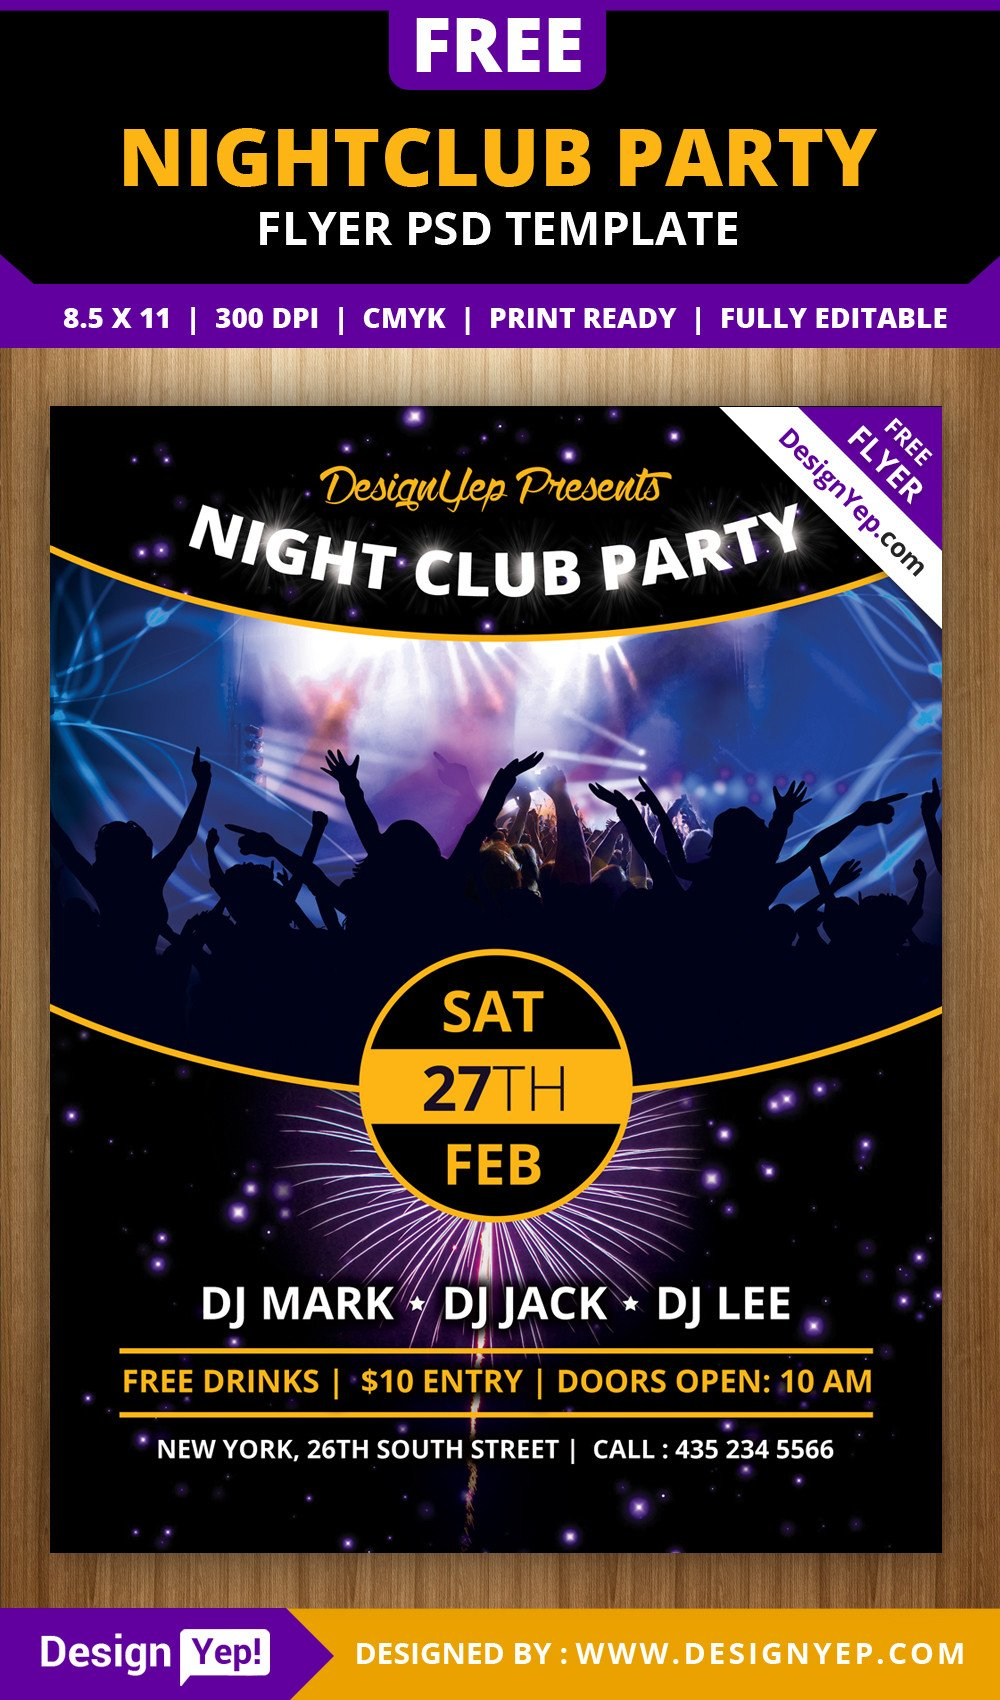 Free Party Flyer Templates Free Nightclub Party Flyer Psd Template Designyep